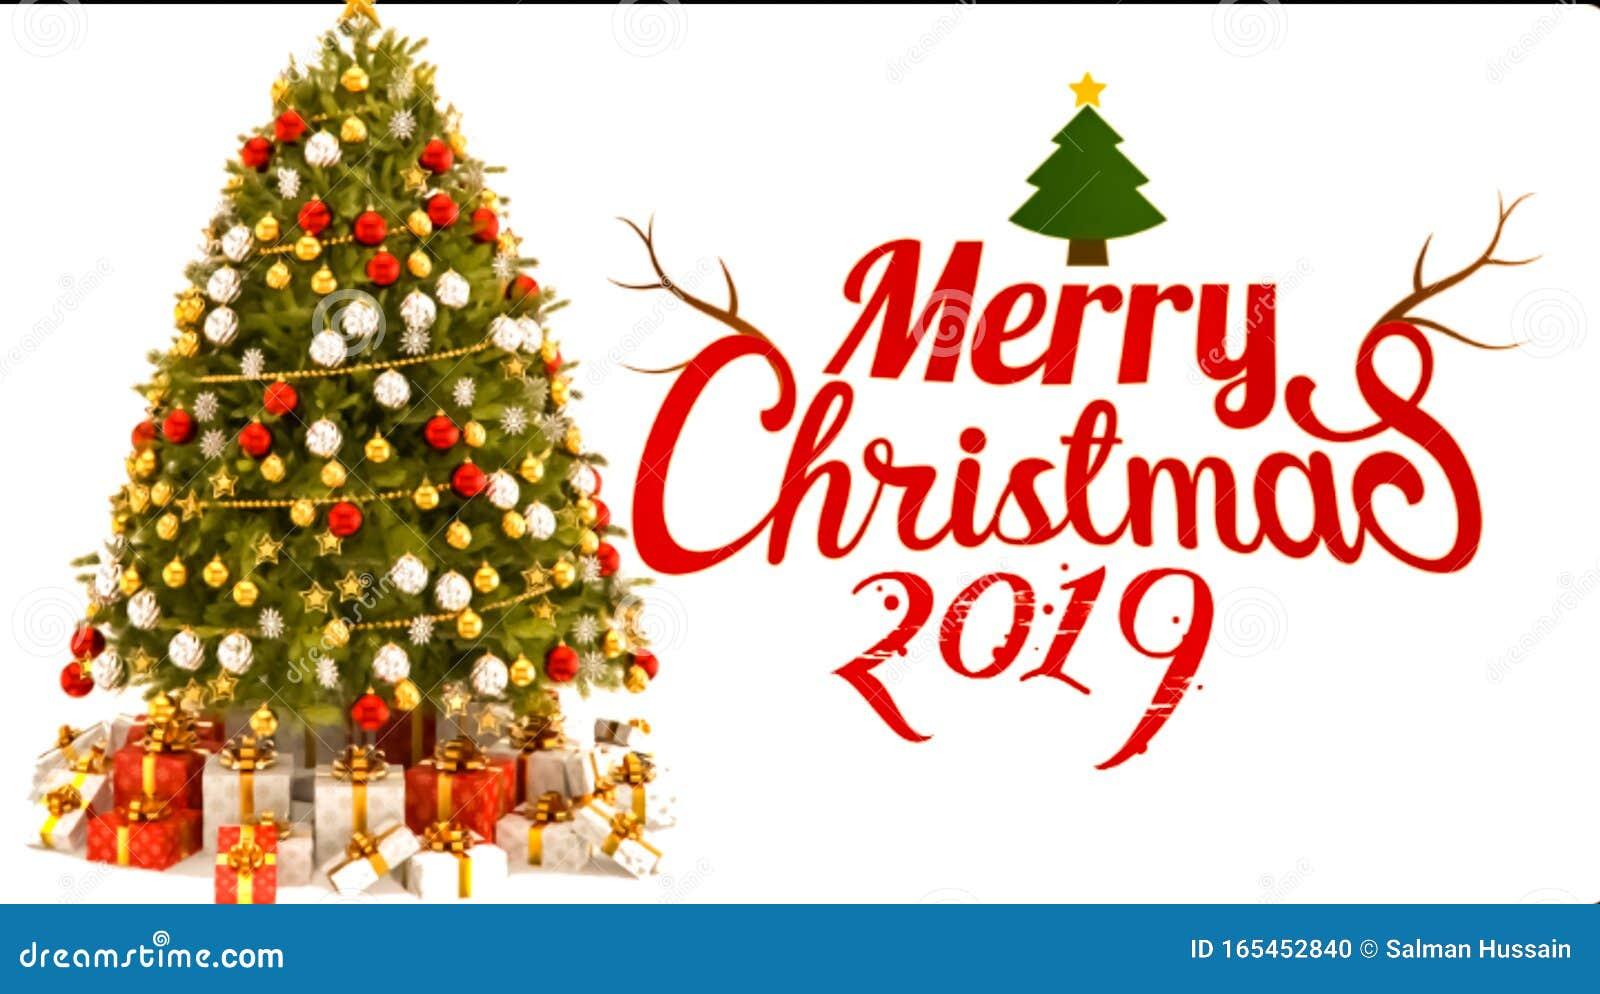 Landscape background of Merry Christmas celebration 2019